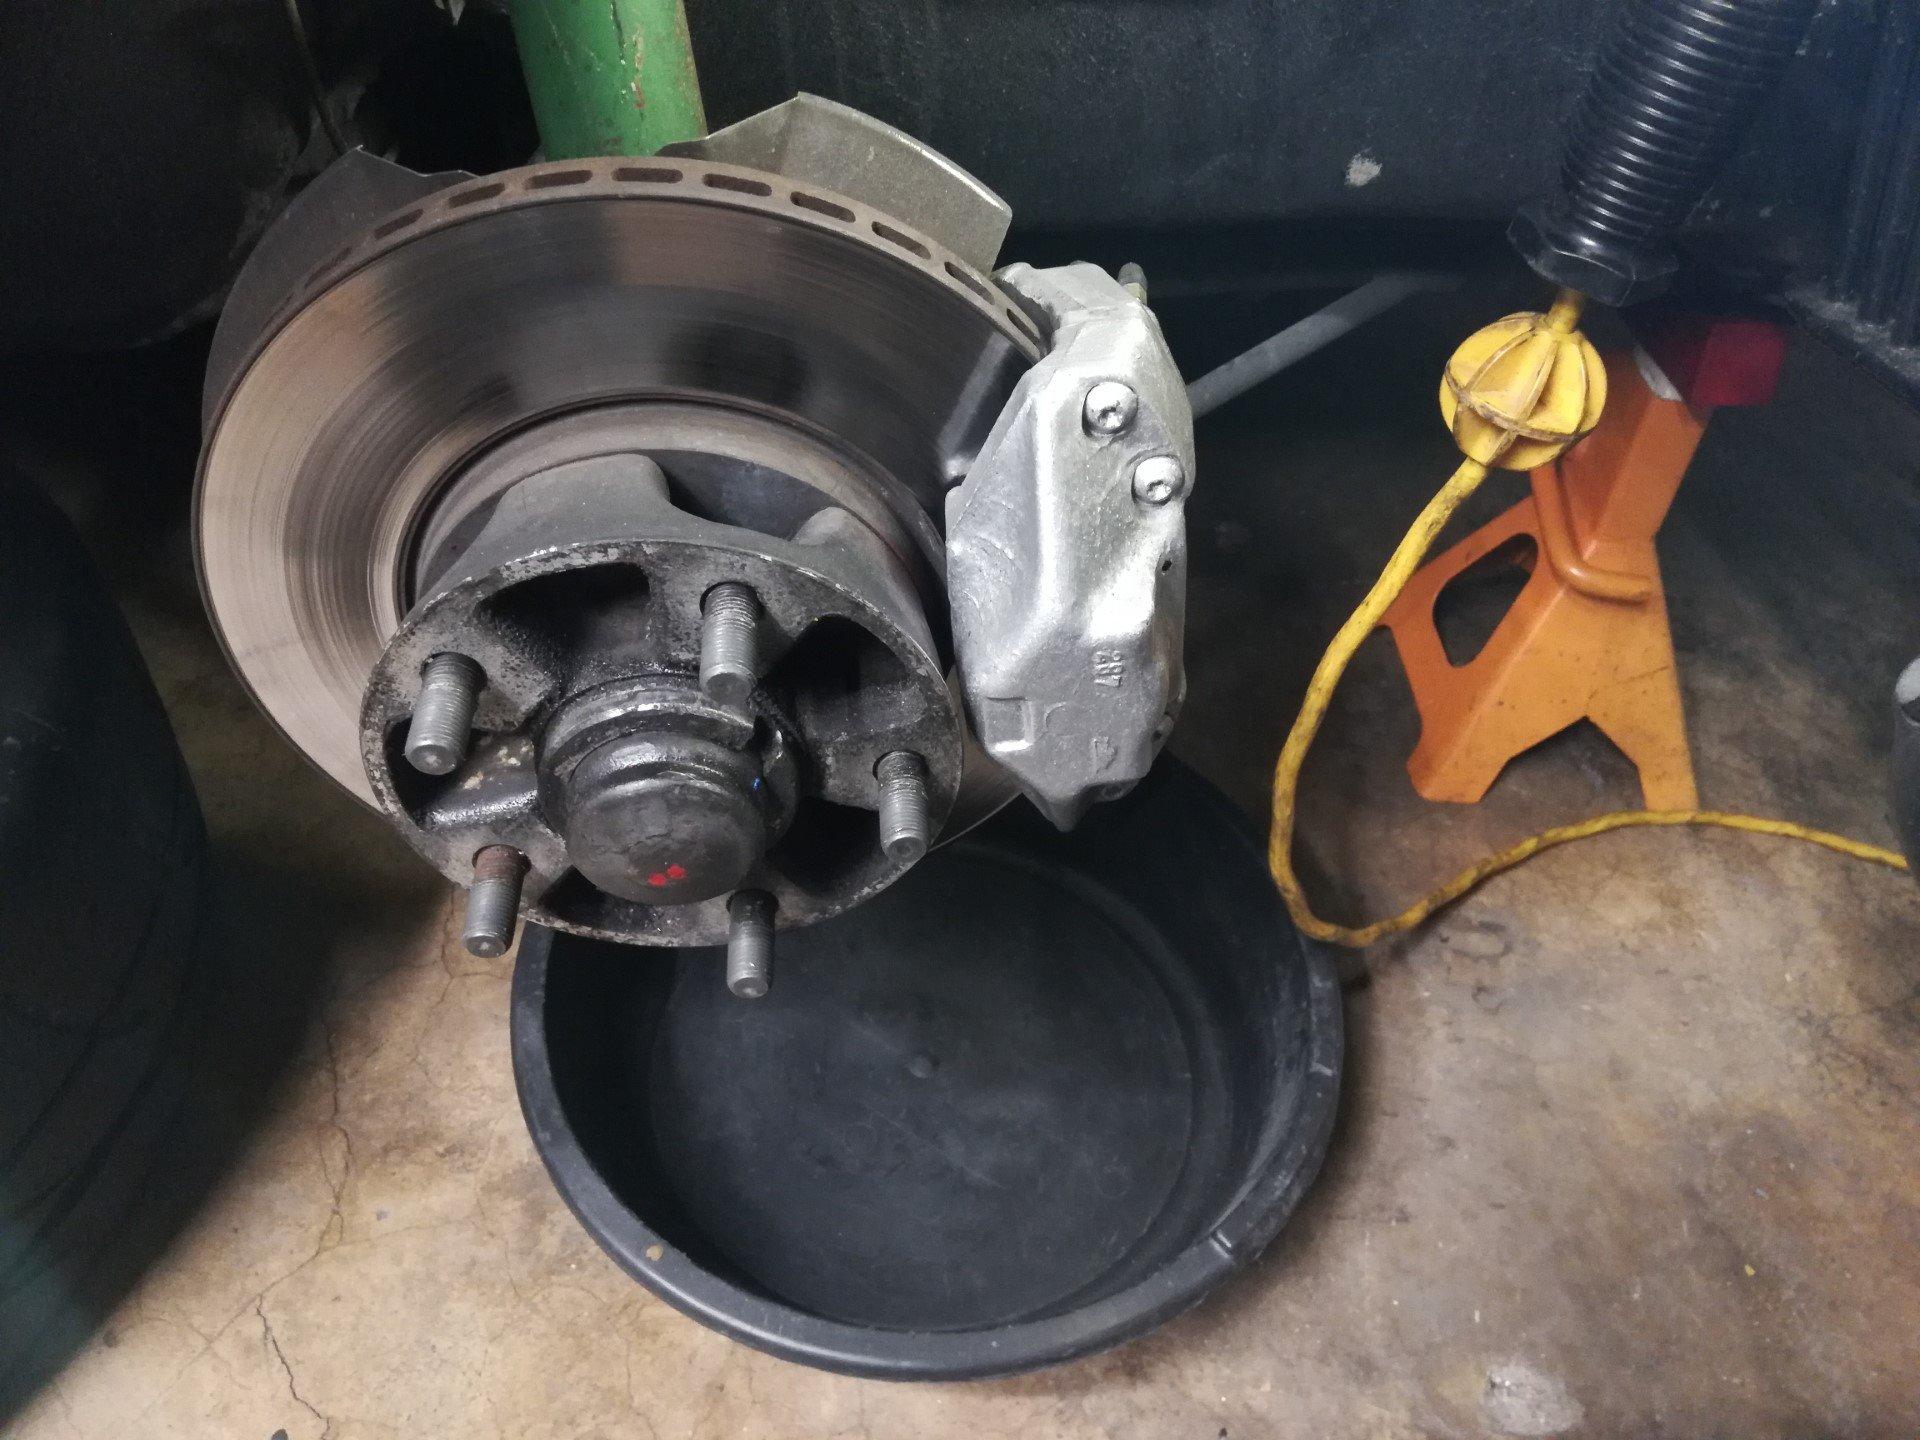 Air-cooled Porsche 911 front brake assembly